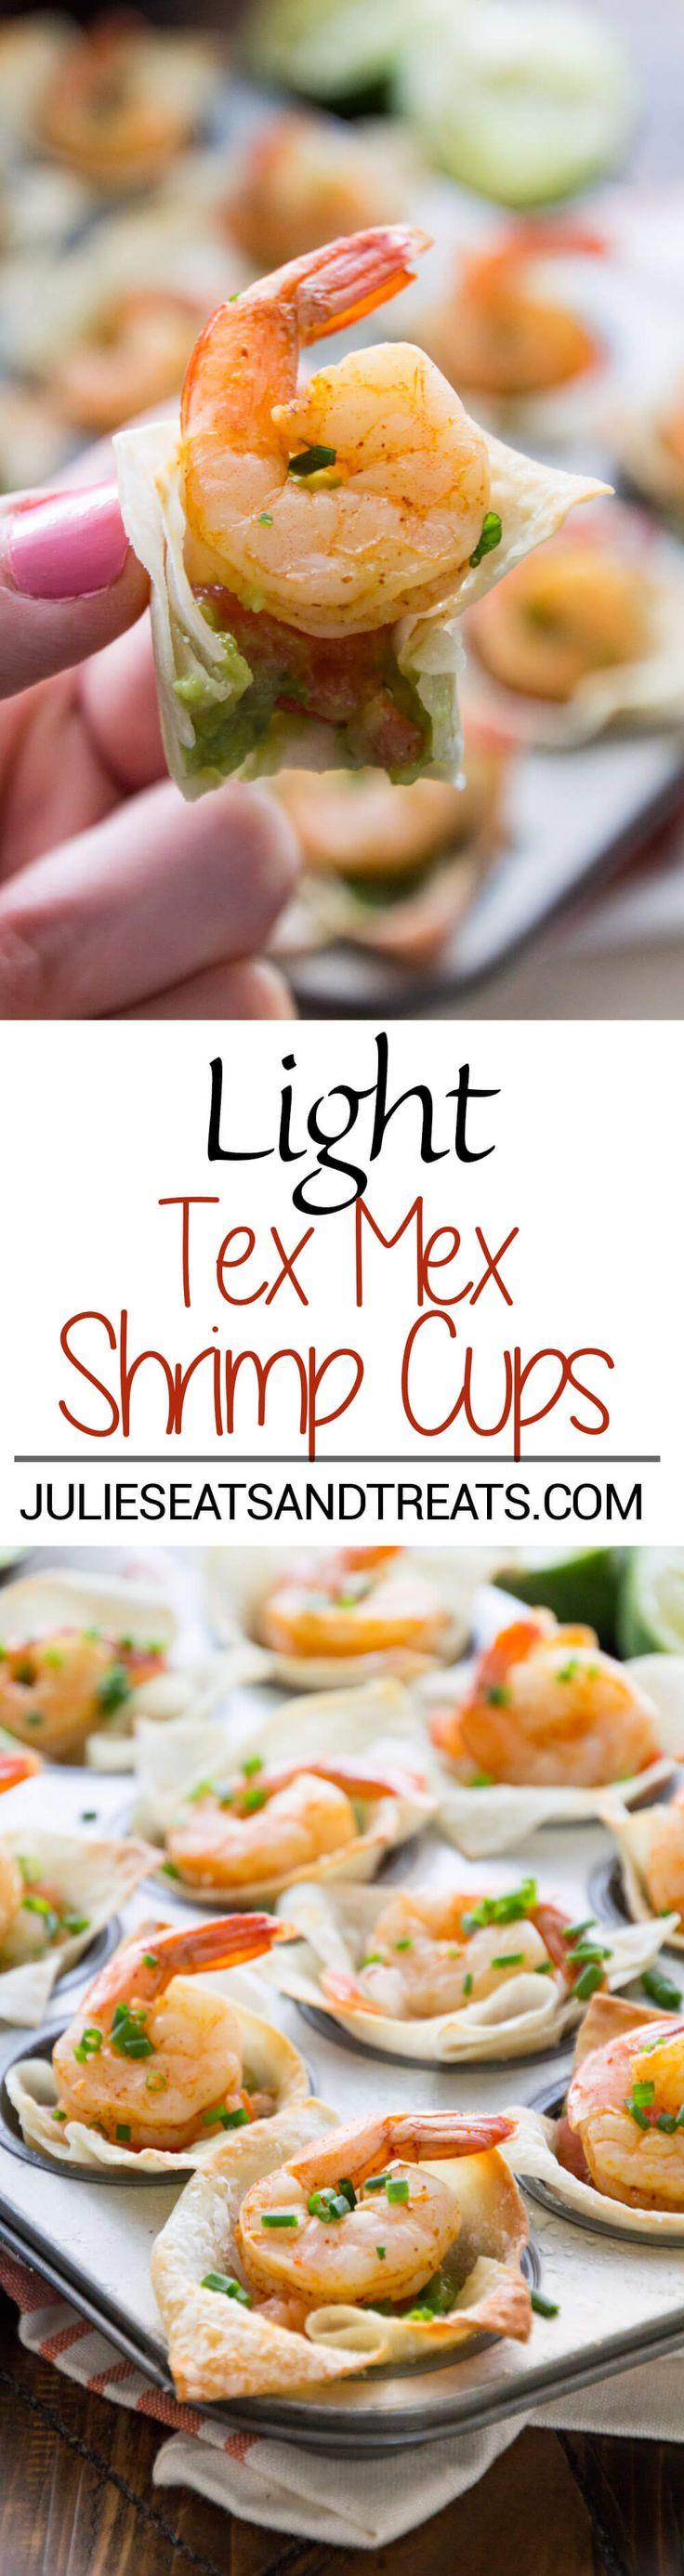 Light Tex Mex Shrimp Bites Recipe ~ Perfect Holiday Appetizer! Crunchy Wonton Shells Stuffed with Pico de Gallo, Guacamole, and Shrimp! Plus, it's a Light Appetizer So You Won't Feel Guilty! ~ http://www.julieseatsandtreats.com